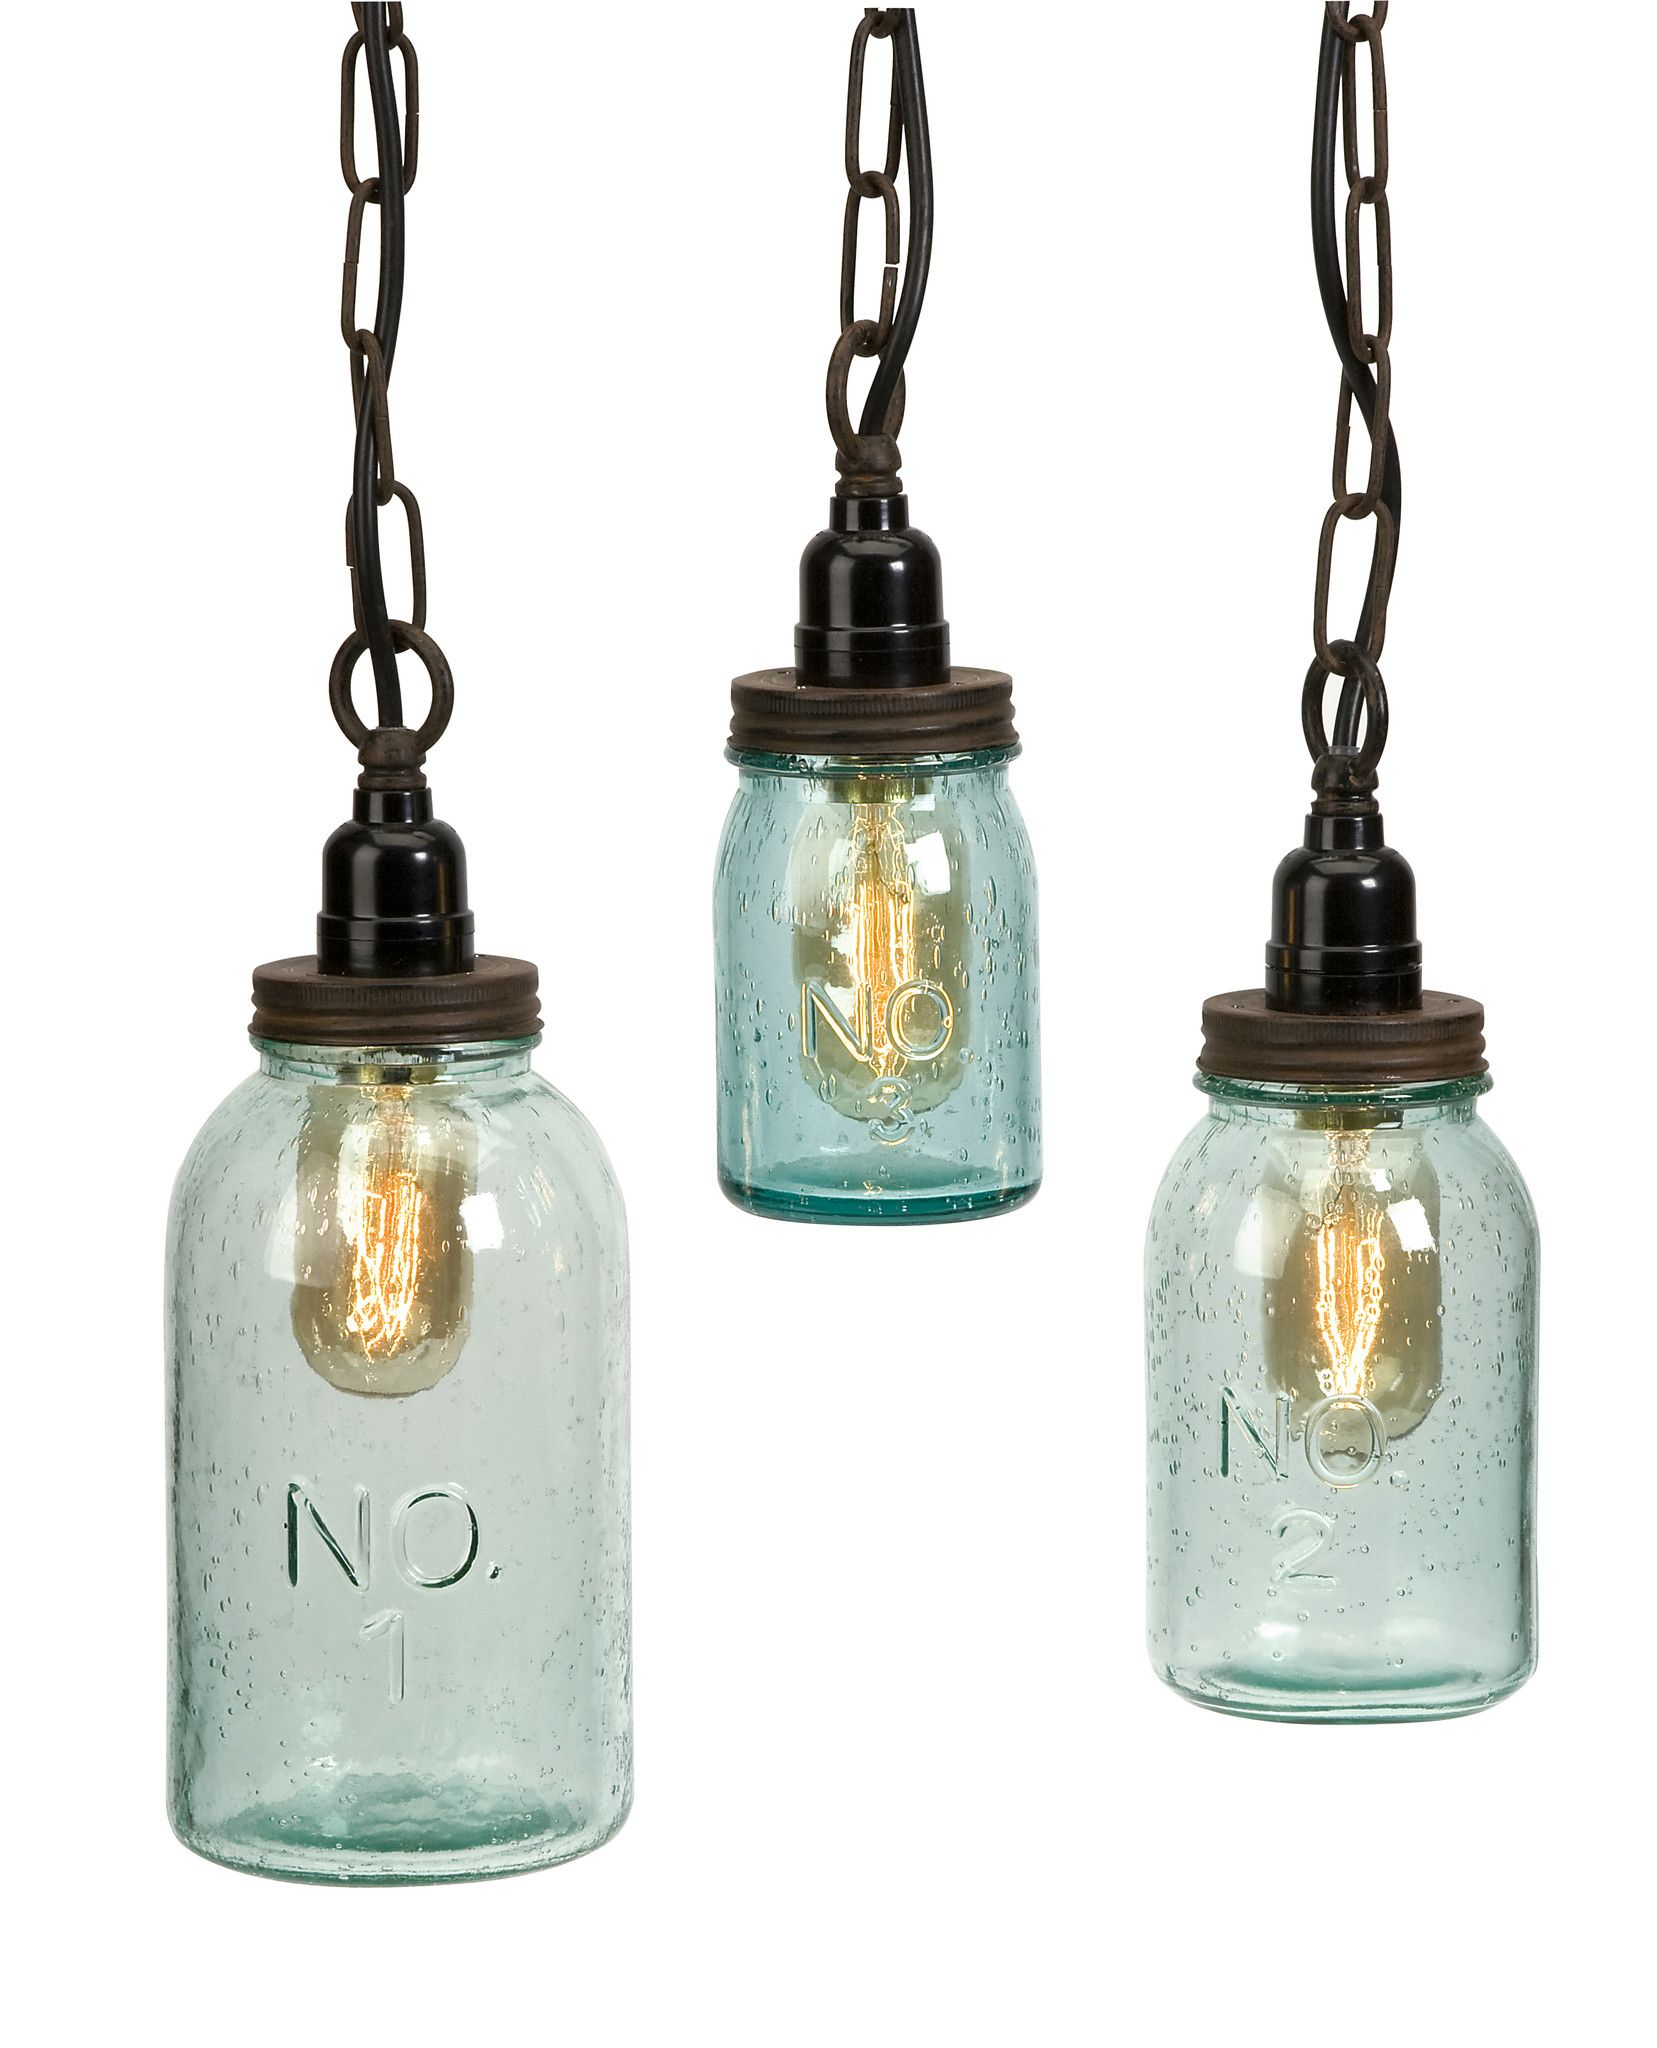 Rustic Industrial Modern Handmade Mason Jar Chandelier Rustic: Rustic Industrial Mason Jar Pendant Lights